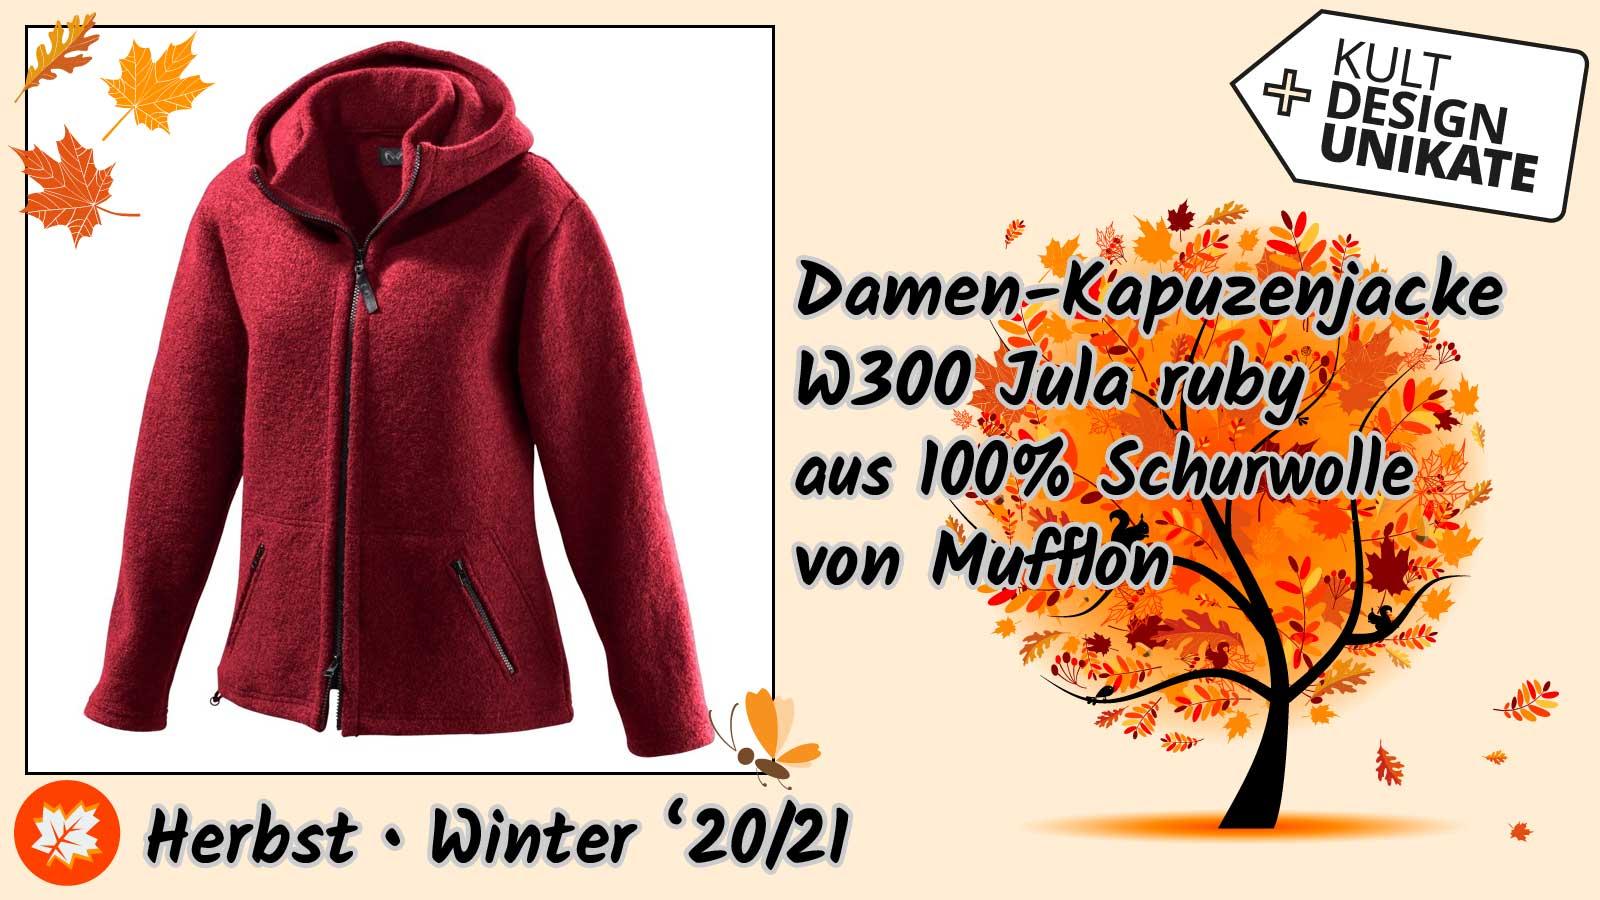 Mufflon-Damen-Kapuzenjacke-W300-Jula-ruby